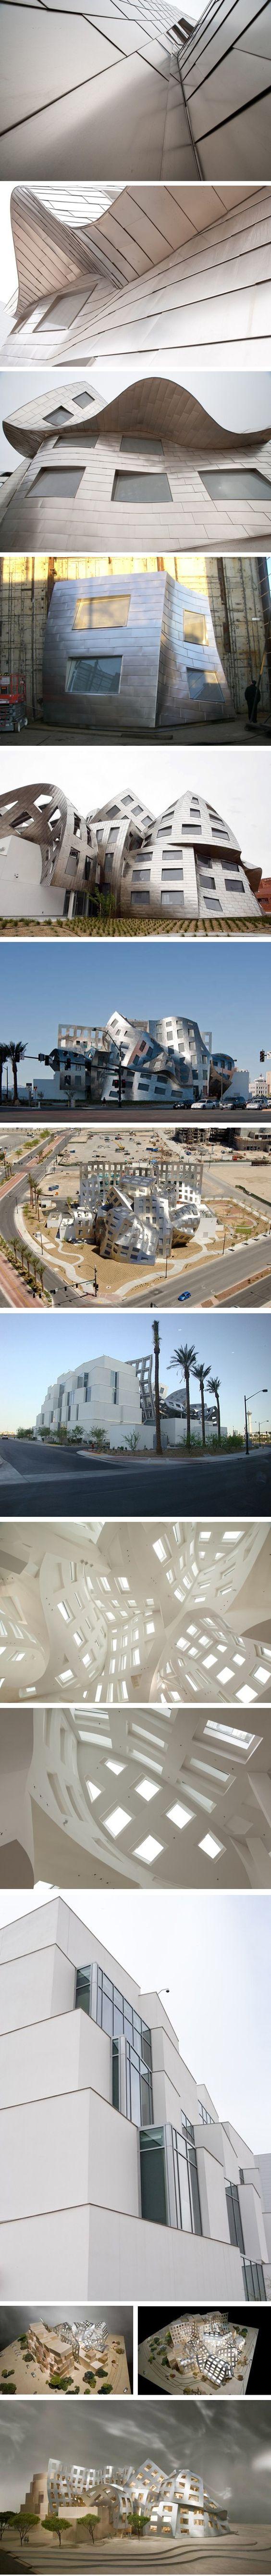 ARCHITECTURE >>> Lou Ruvo Brain Institute par Frank Gehry - Journal du Design